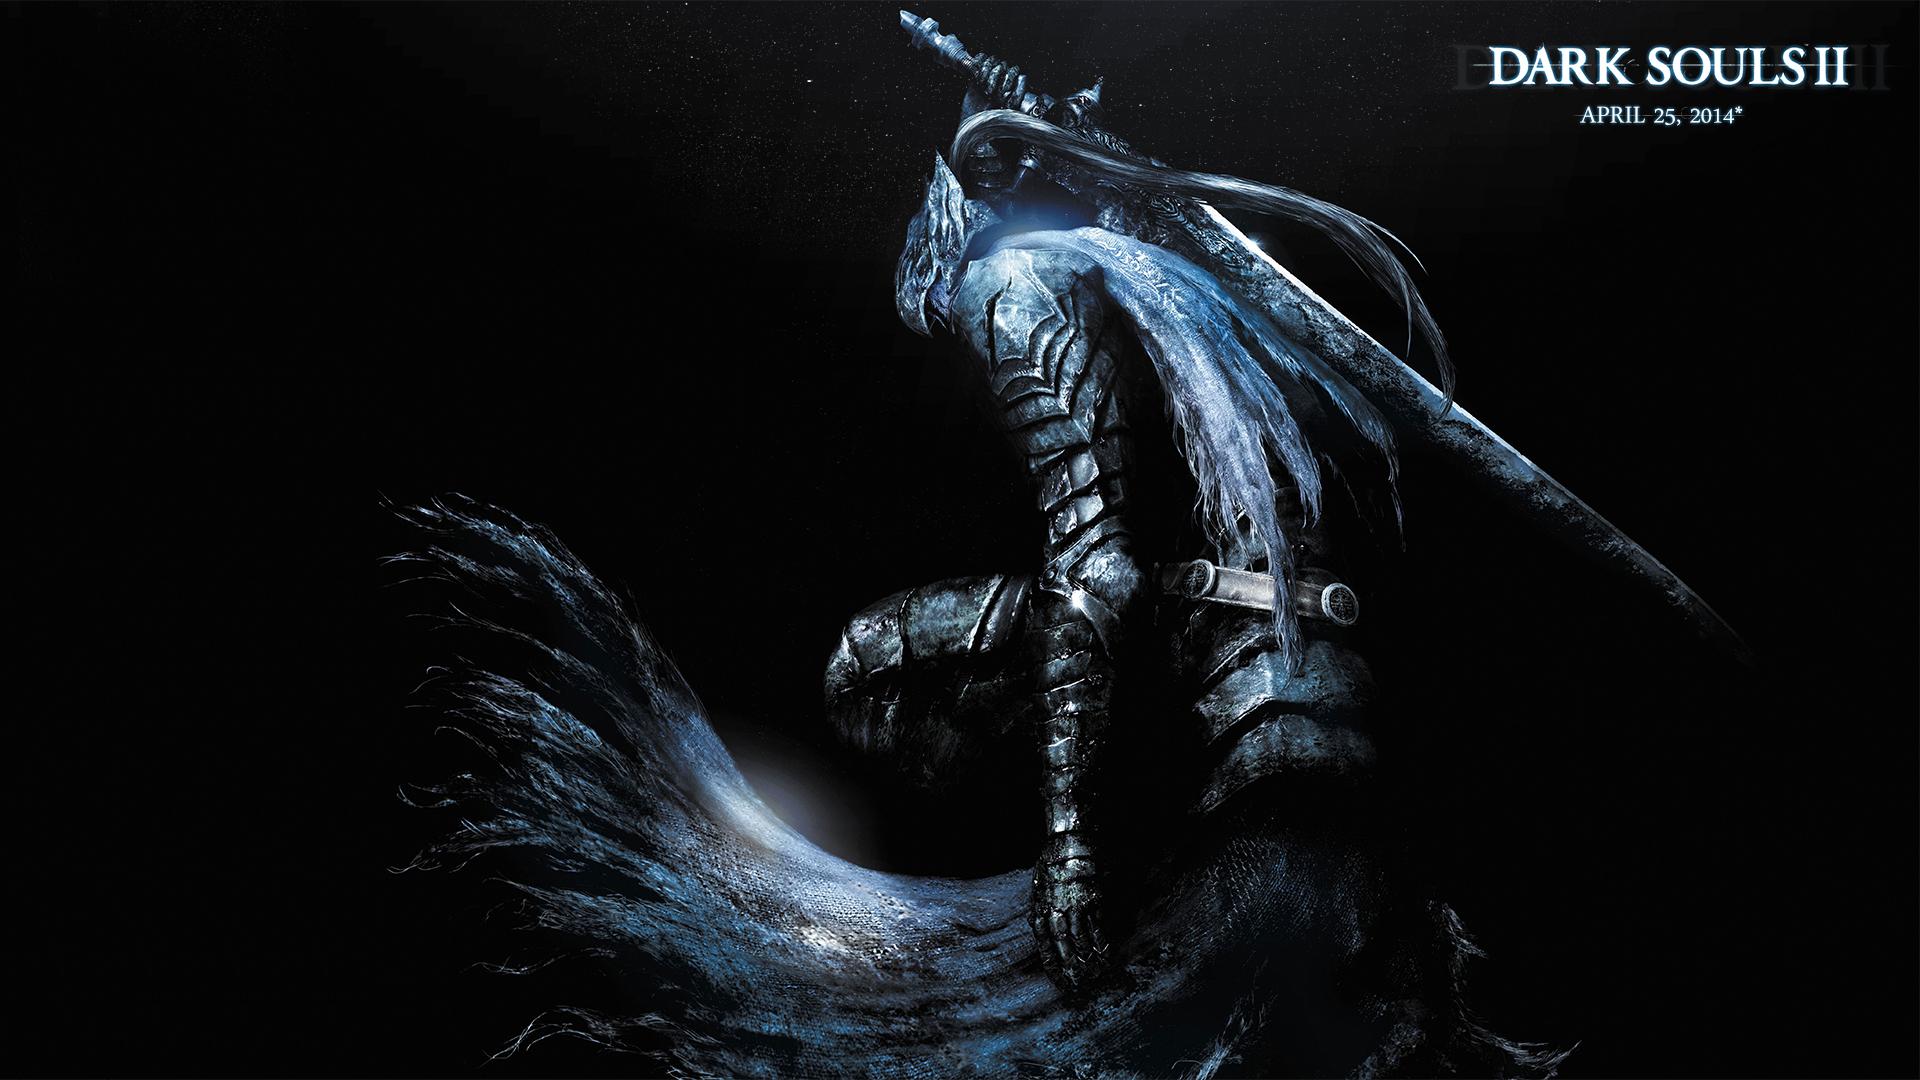 Dark Souls 2 Wallpaper Blue By Syntheticarts On Deviantart